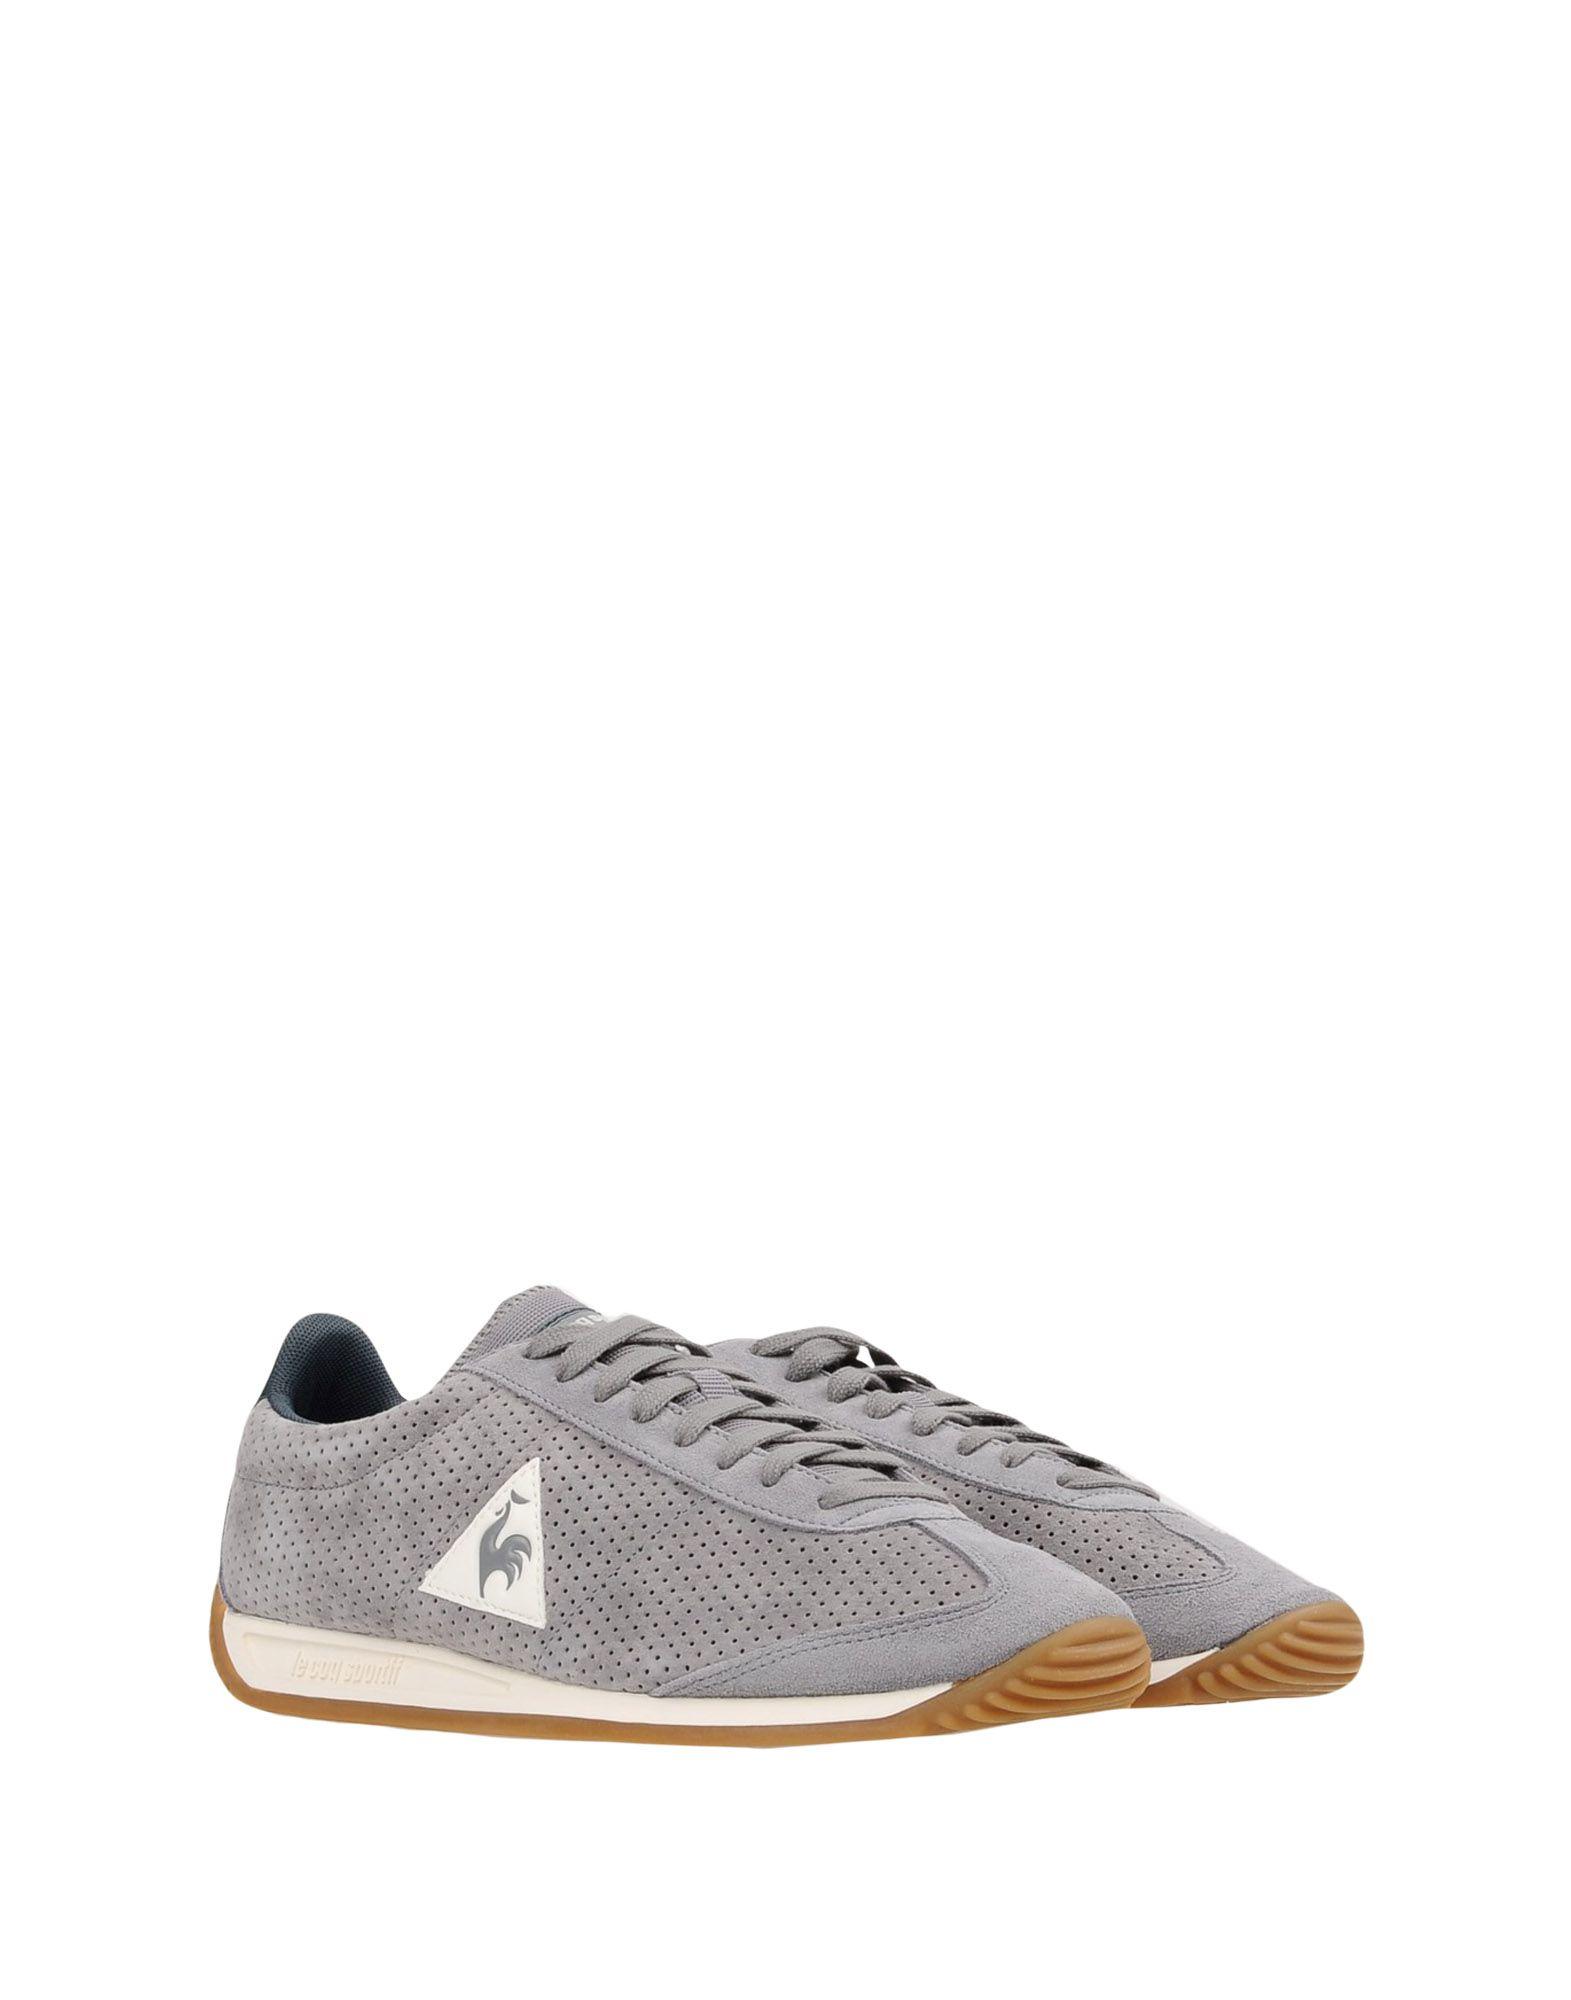 Sneakers Le Coq Sportif Quartz Perforated Nubuck - Homme - Sneakers Le Coq Sportif sur